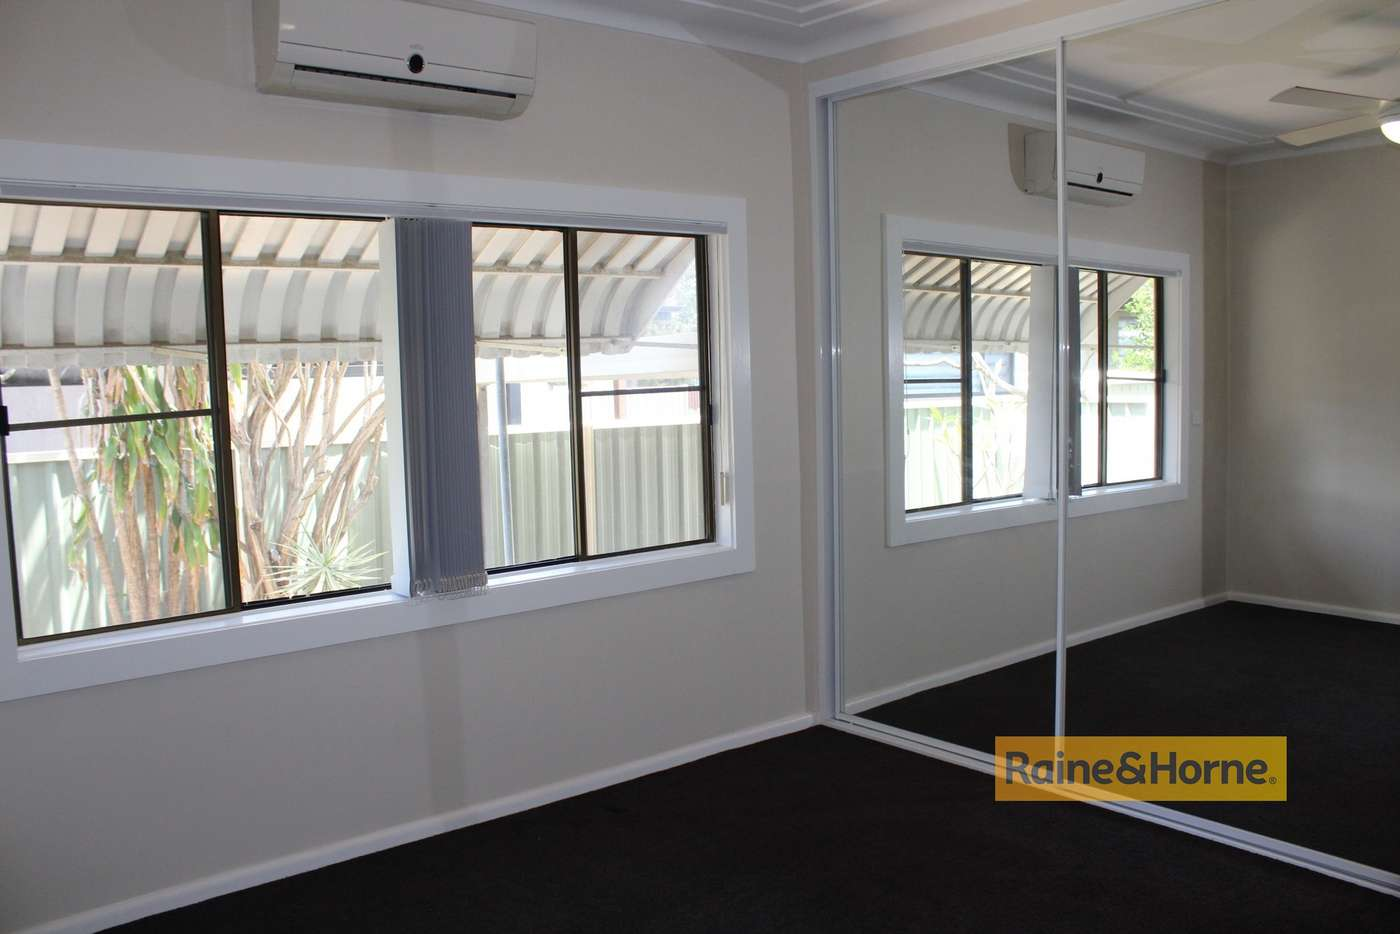 Seventh view of Homely house listing, 46 Ridge Street, Ettalong Beach NSW 2257